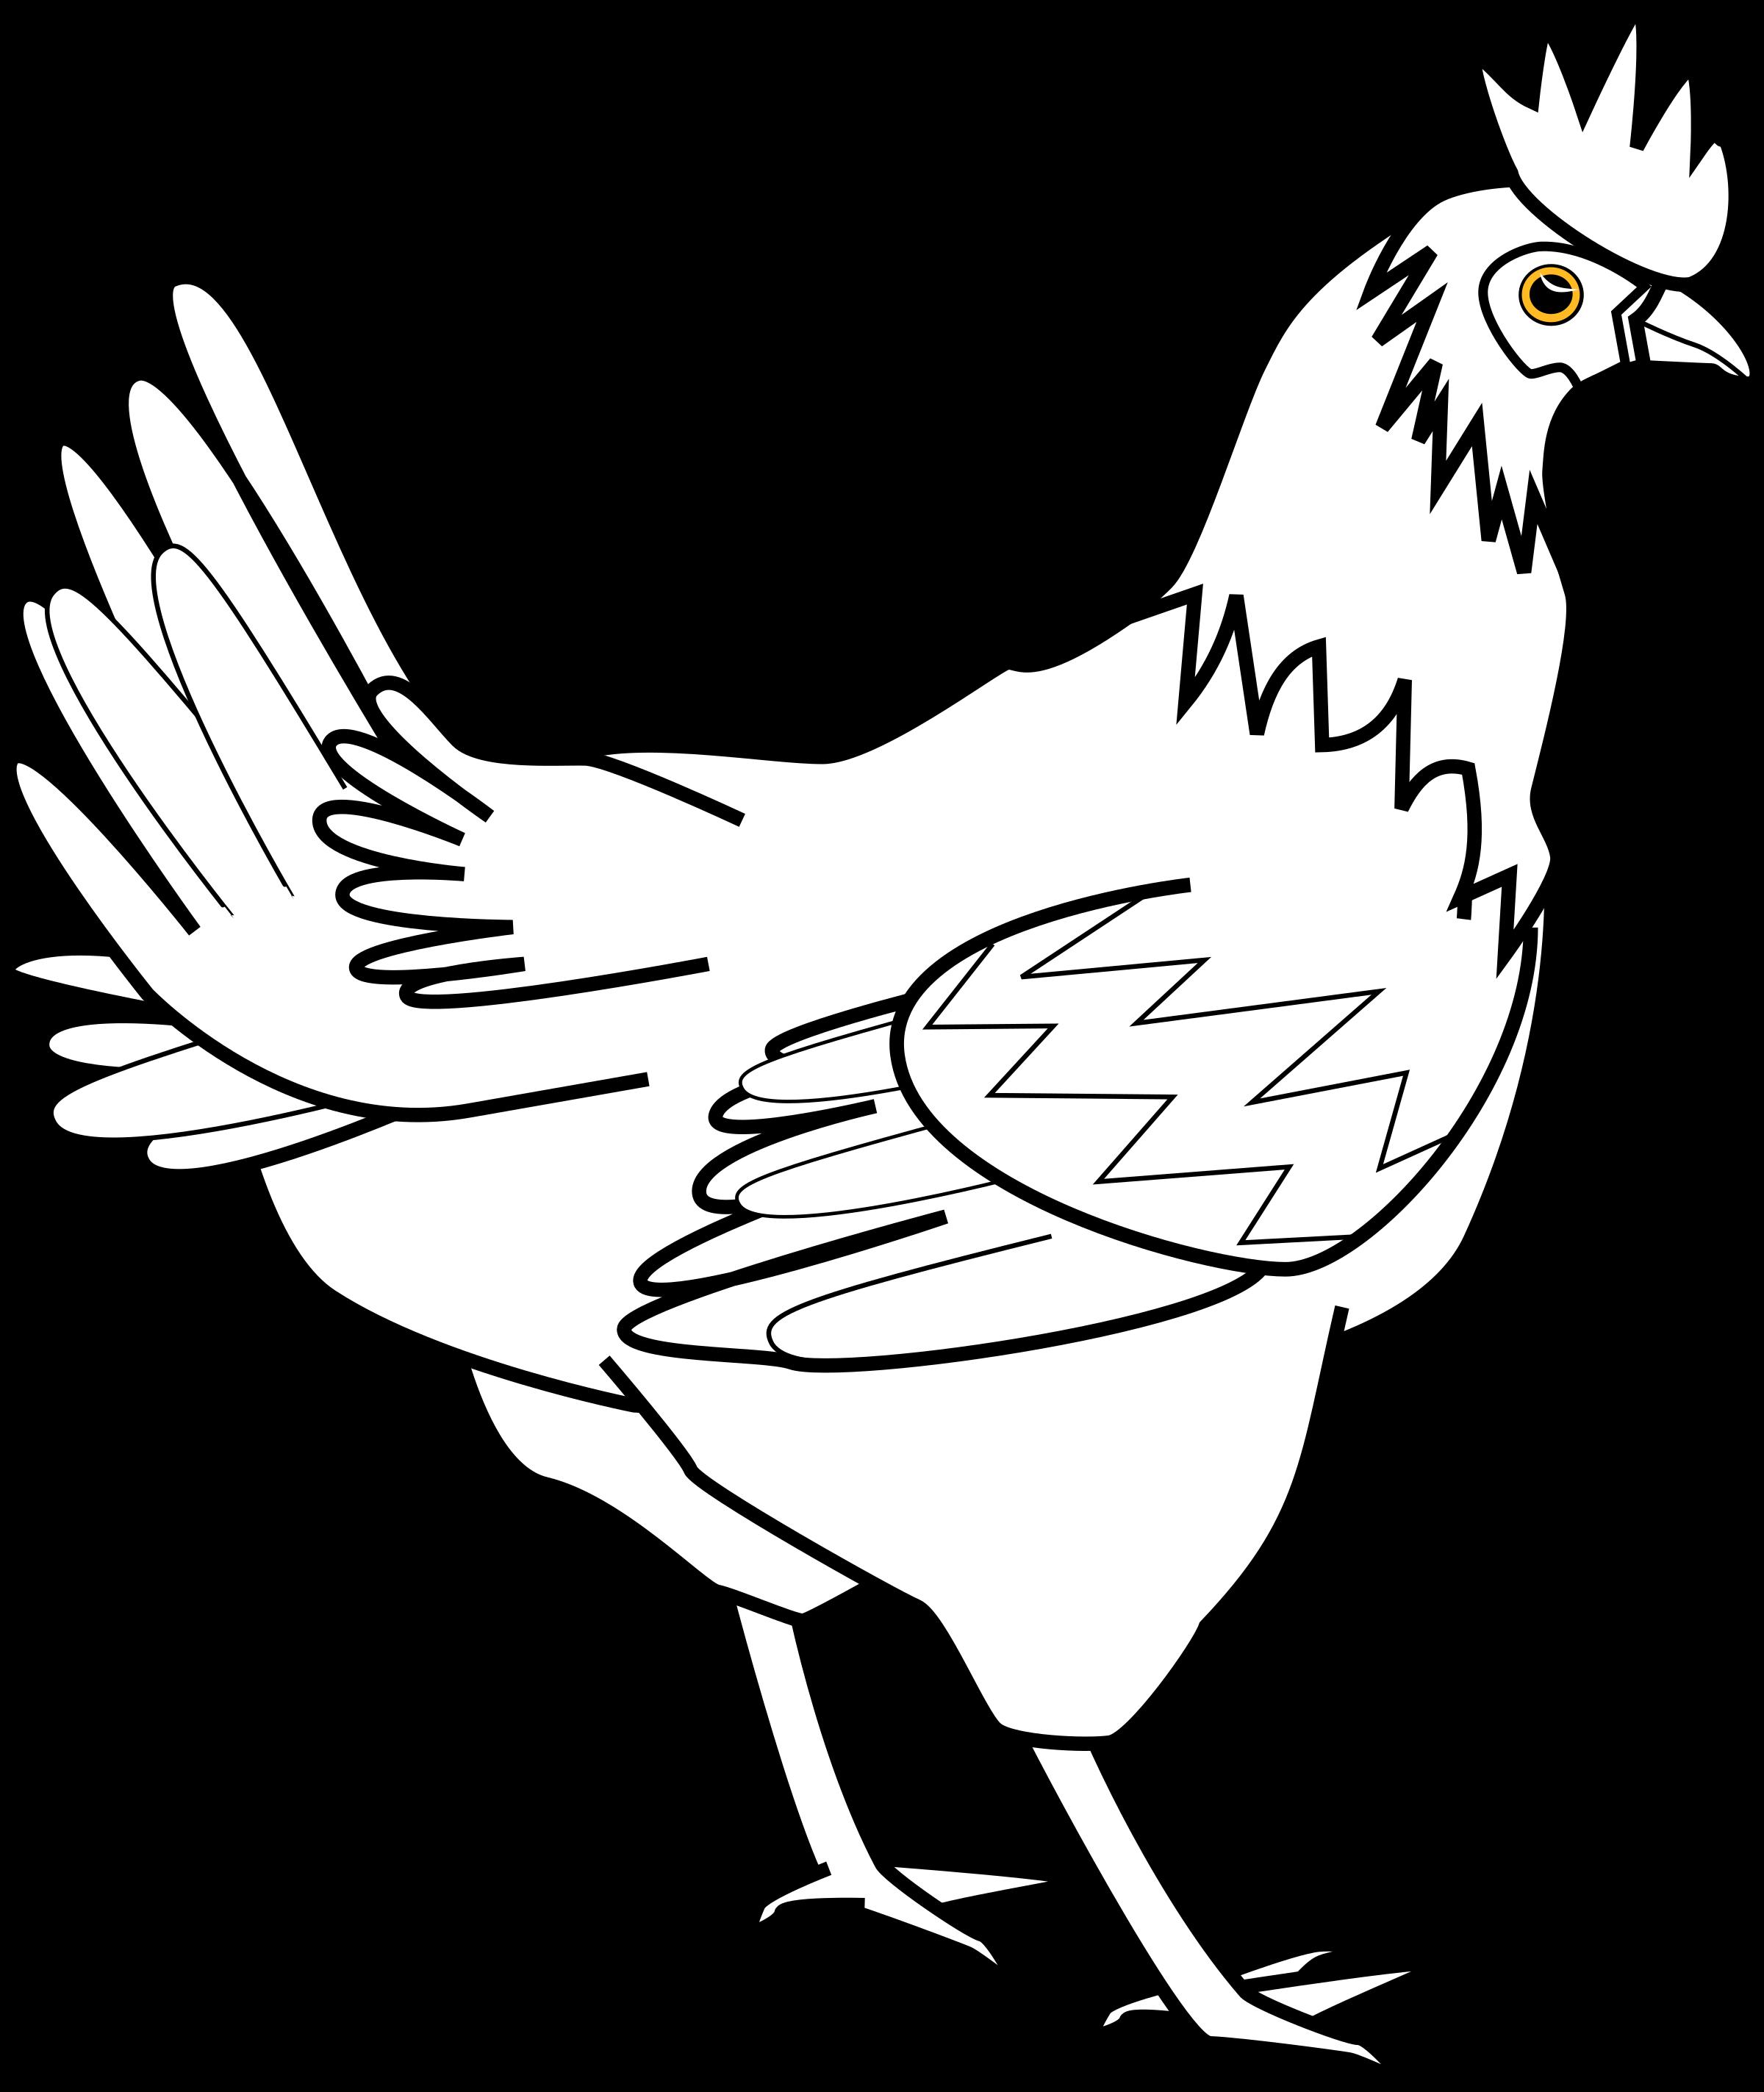 2400x2846 Chicken Line Art Davidone Chicken By Gammillian Copic Other Than